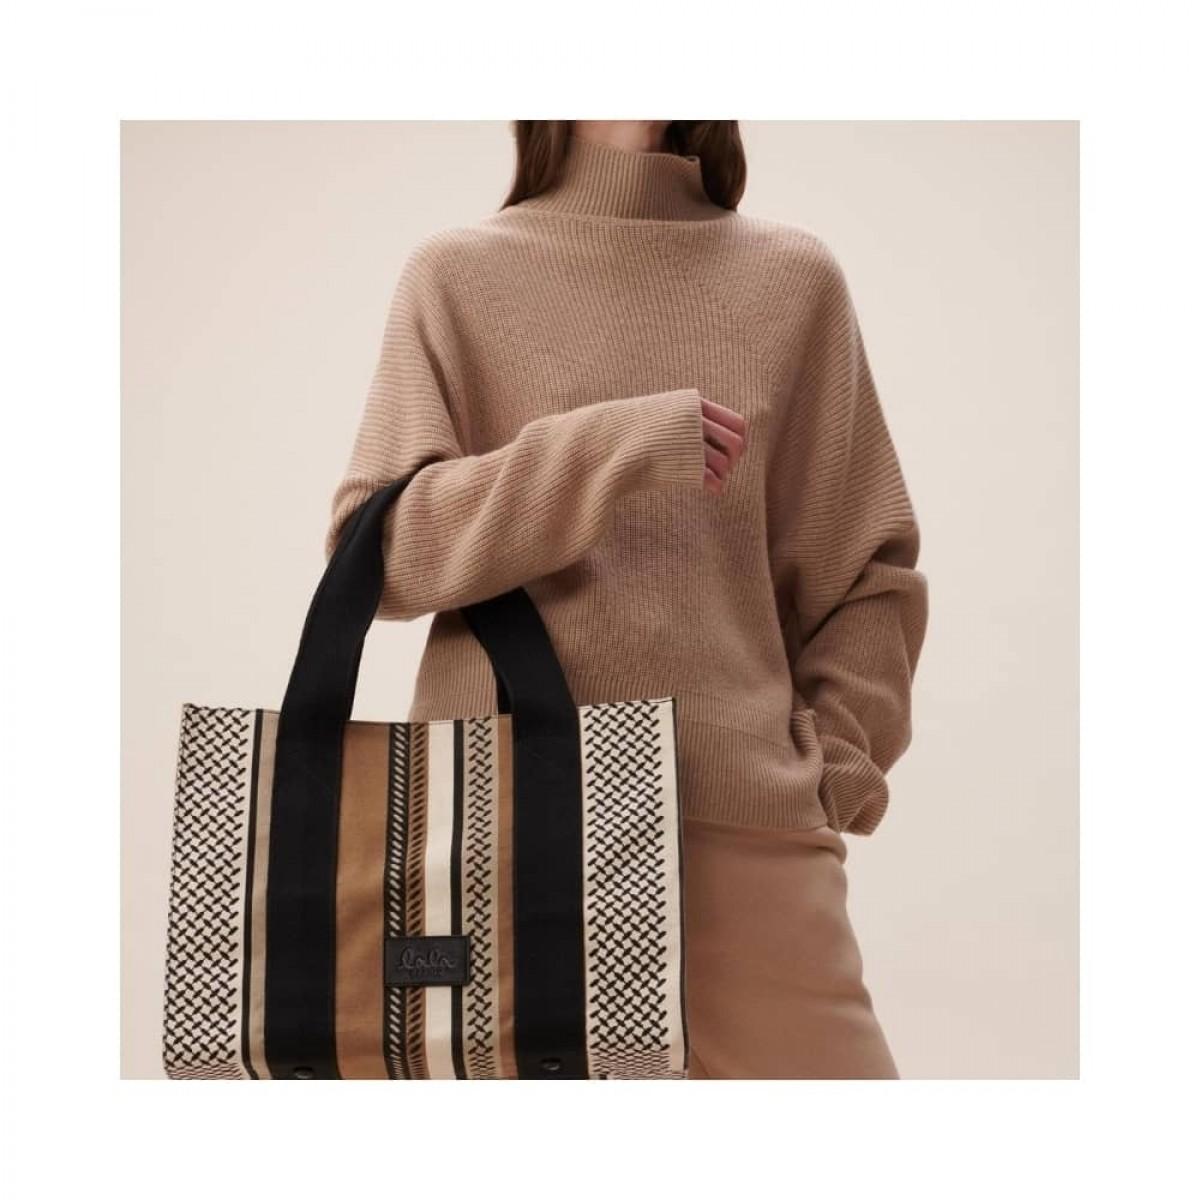 big tote josie bag - kufiya hessian dune - model front